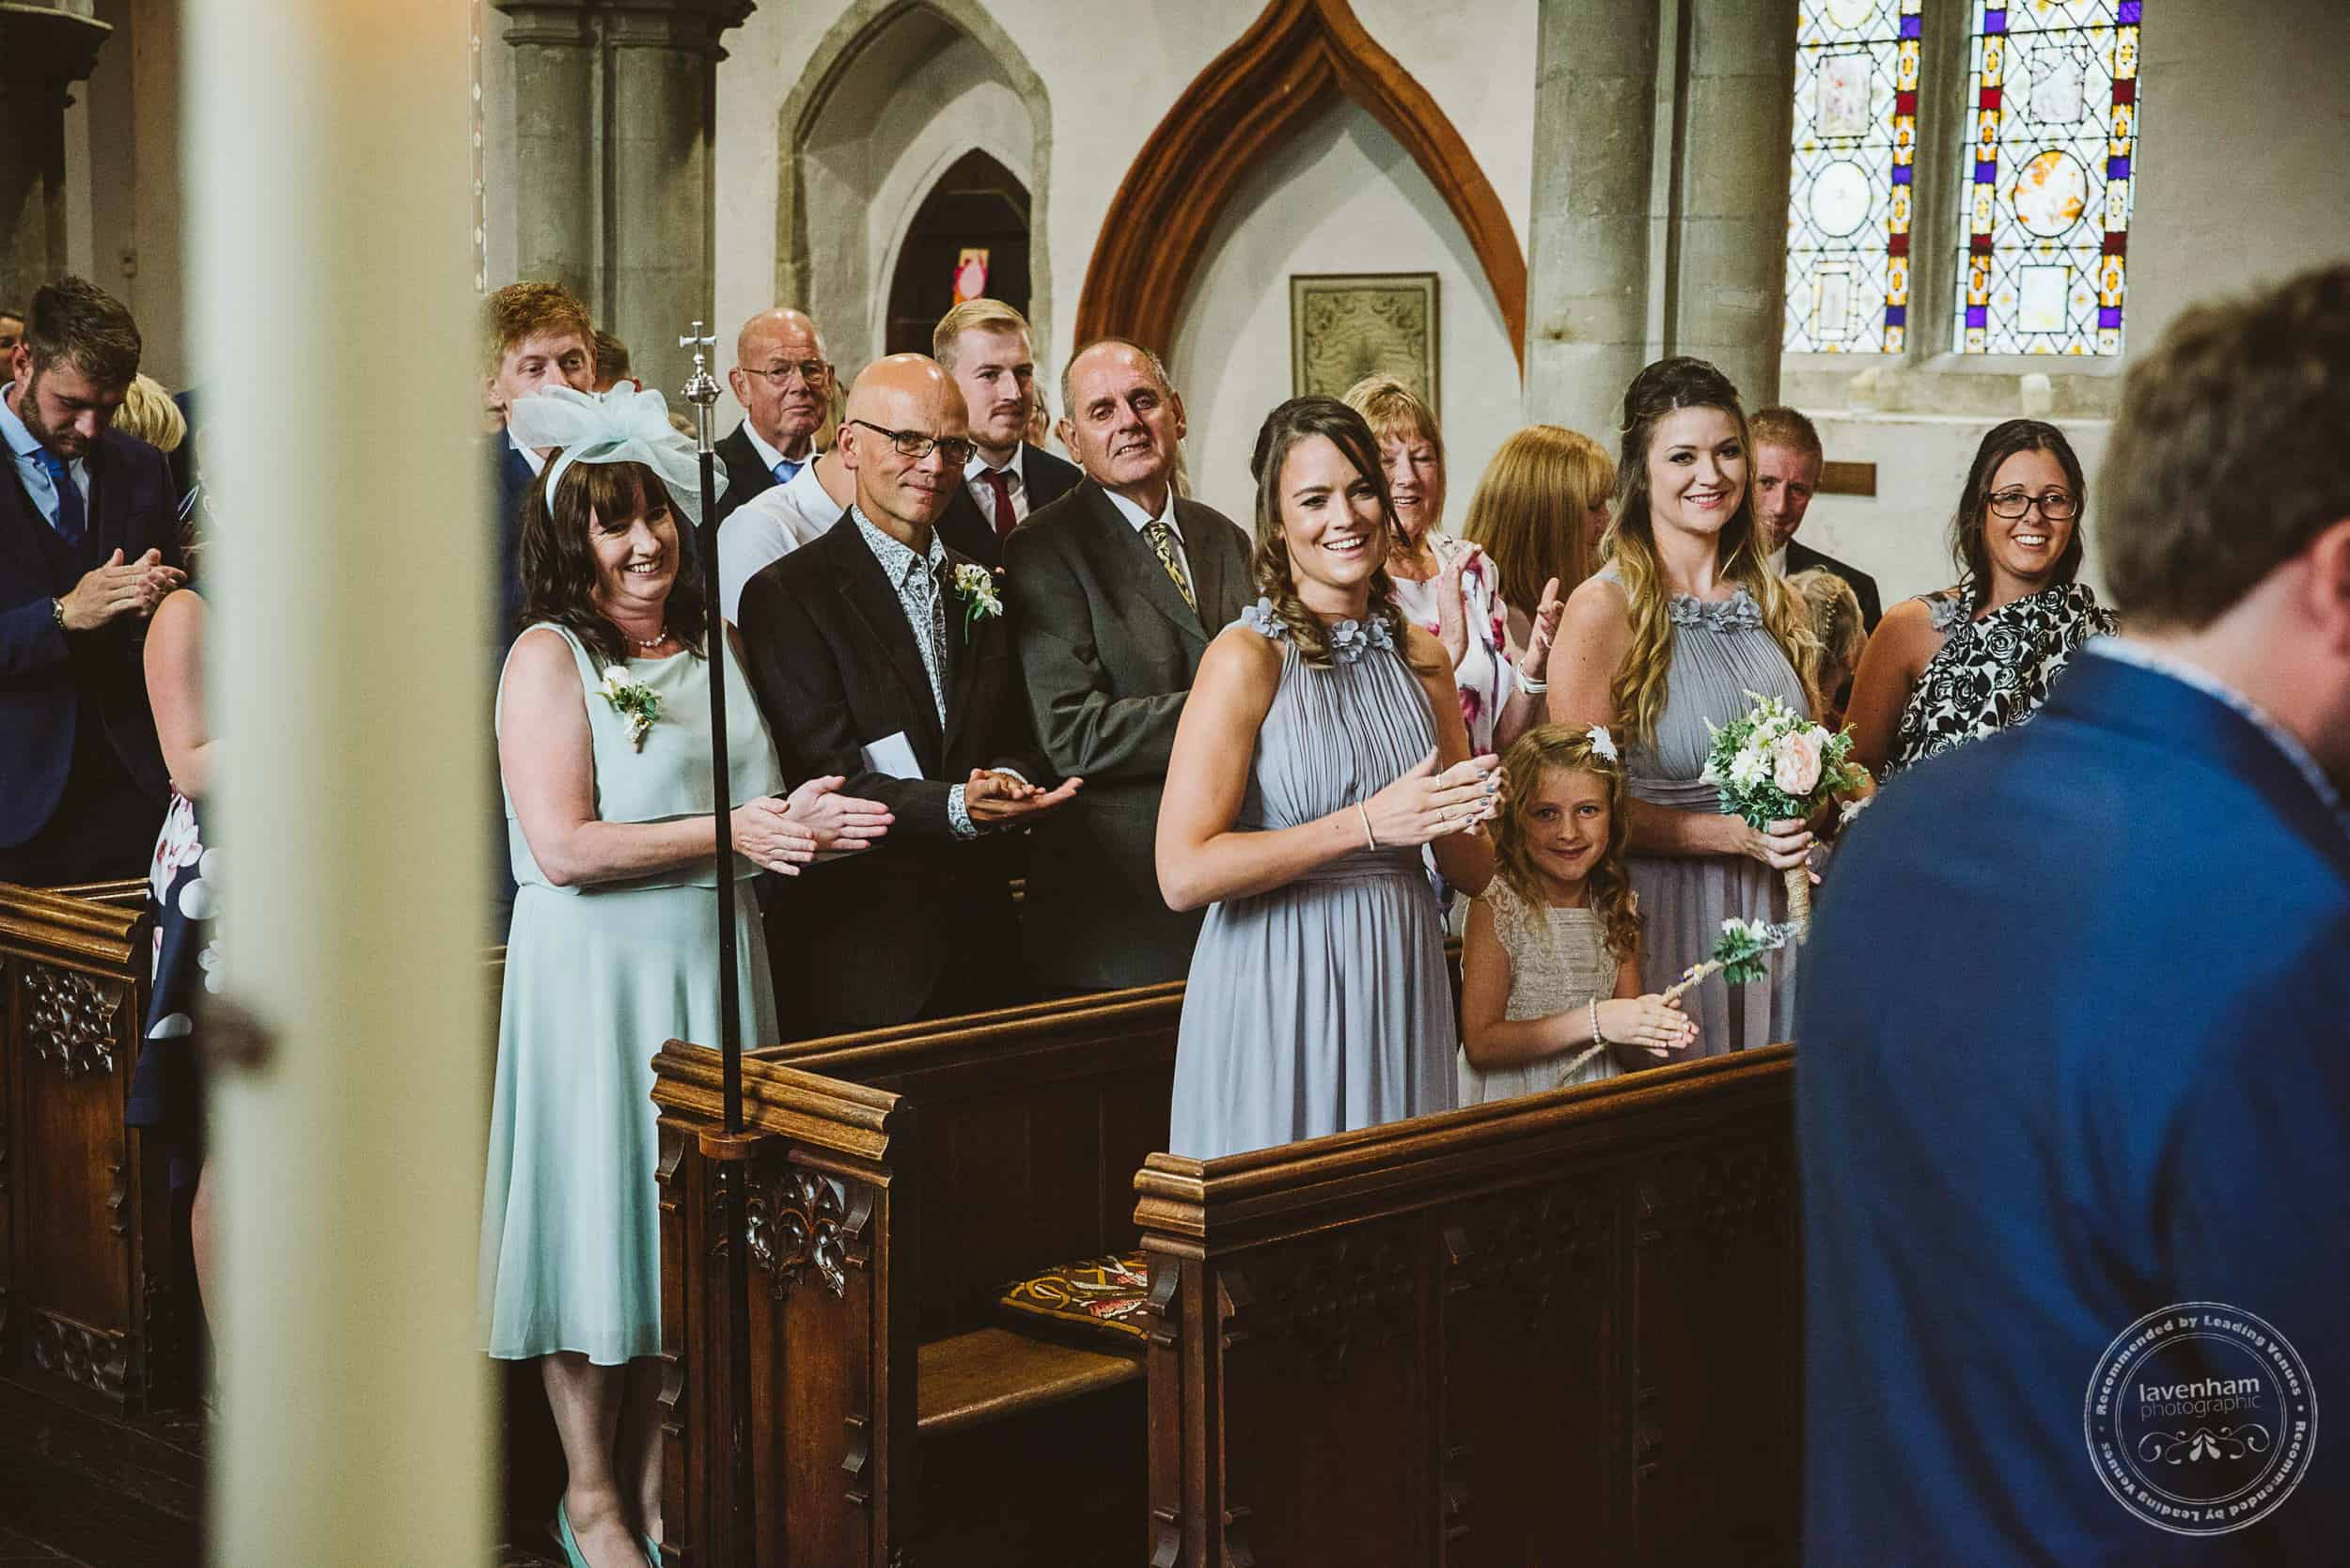 180818 Marks Hall Wedding Photography Lavenham Photographic 057